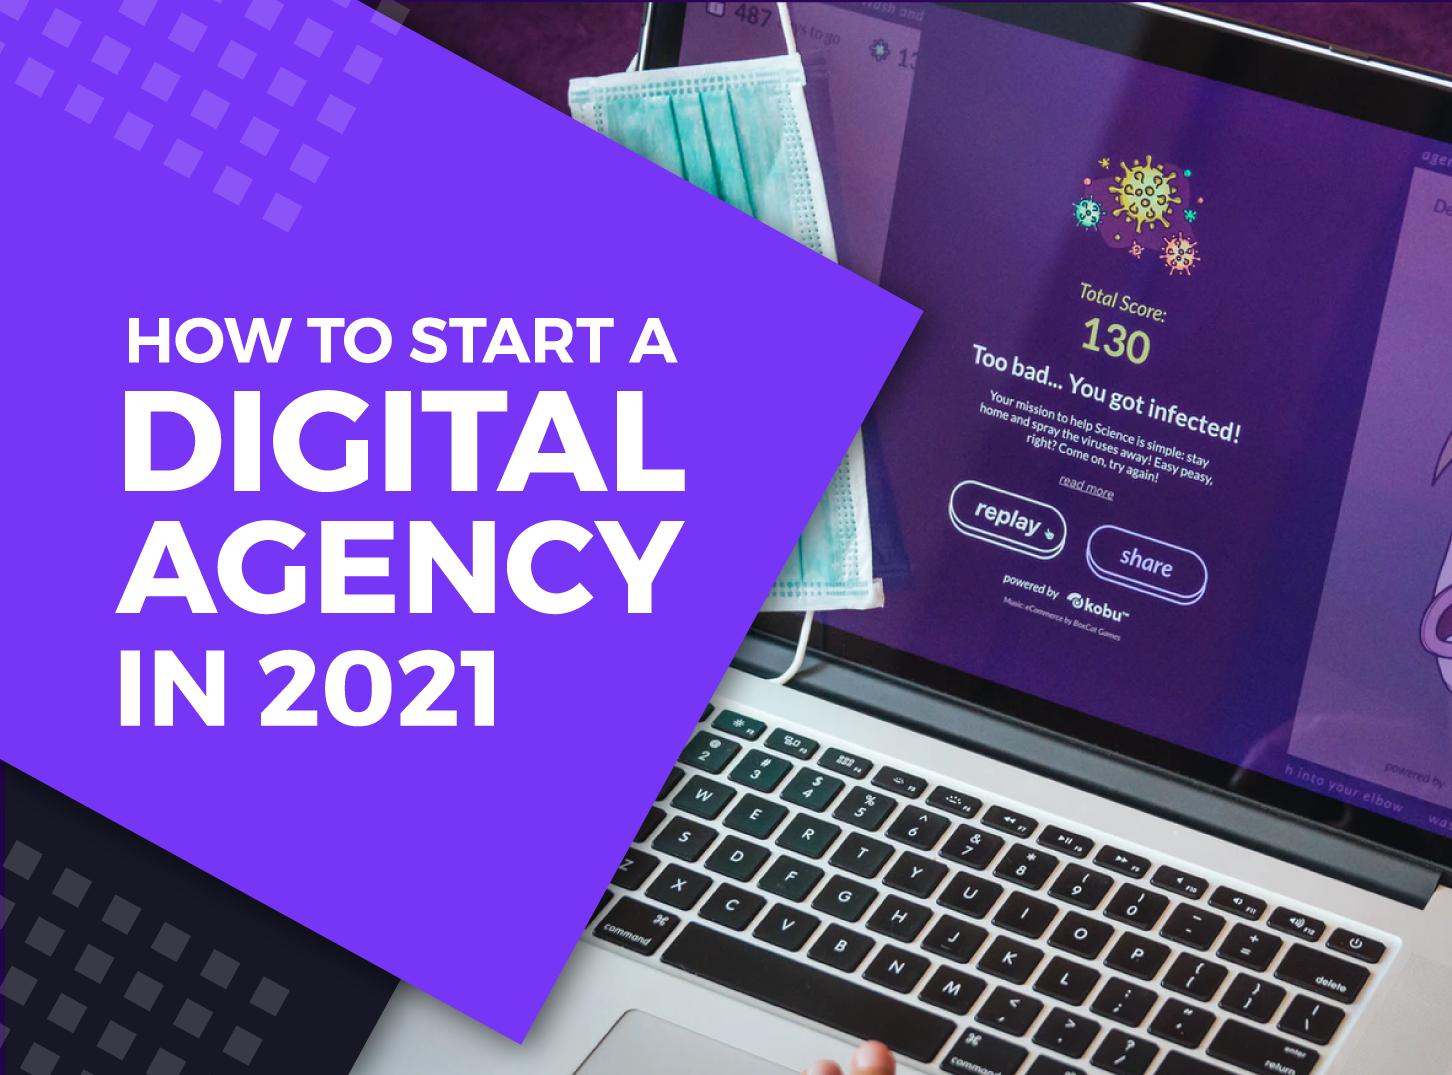 How to Start a Digital Agency in 2021 - Inkyy Web Design & Branding Studio